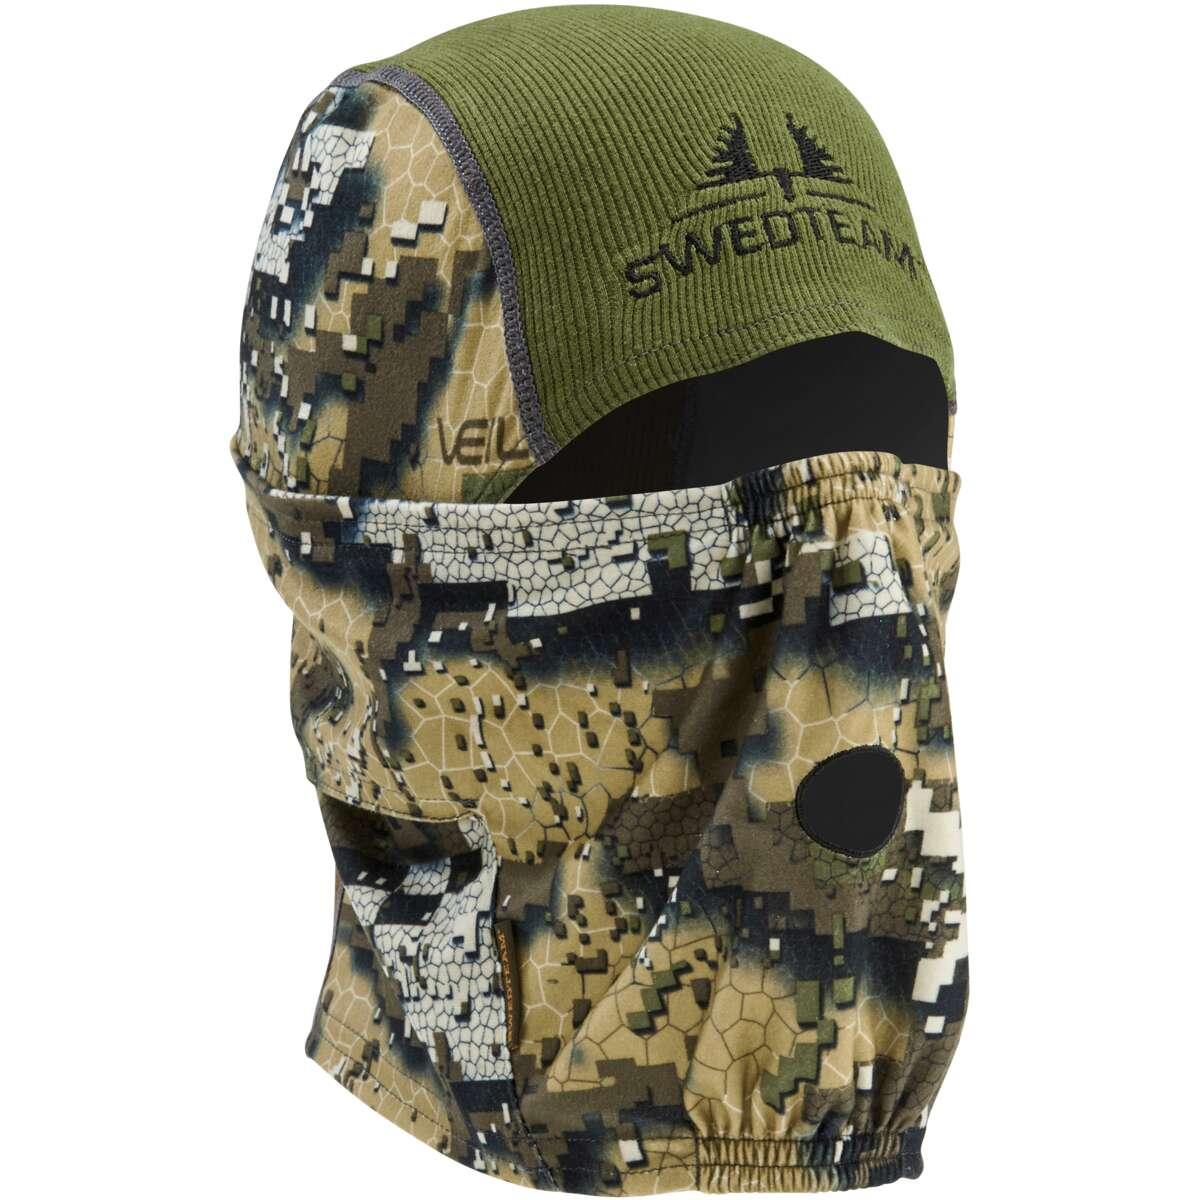 Swedteam Ridge Camouflage hood, Veil naamiohuppu